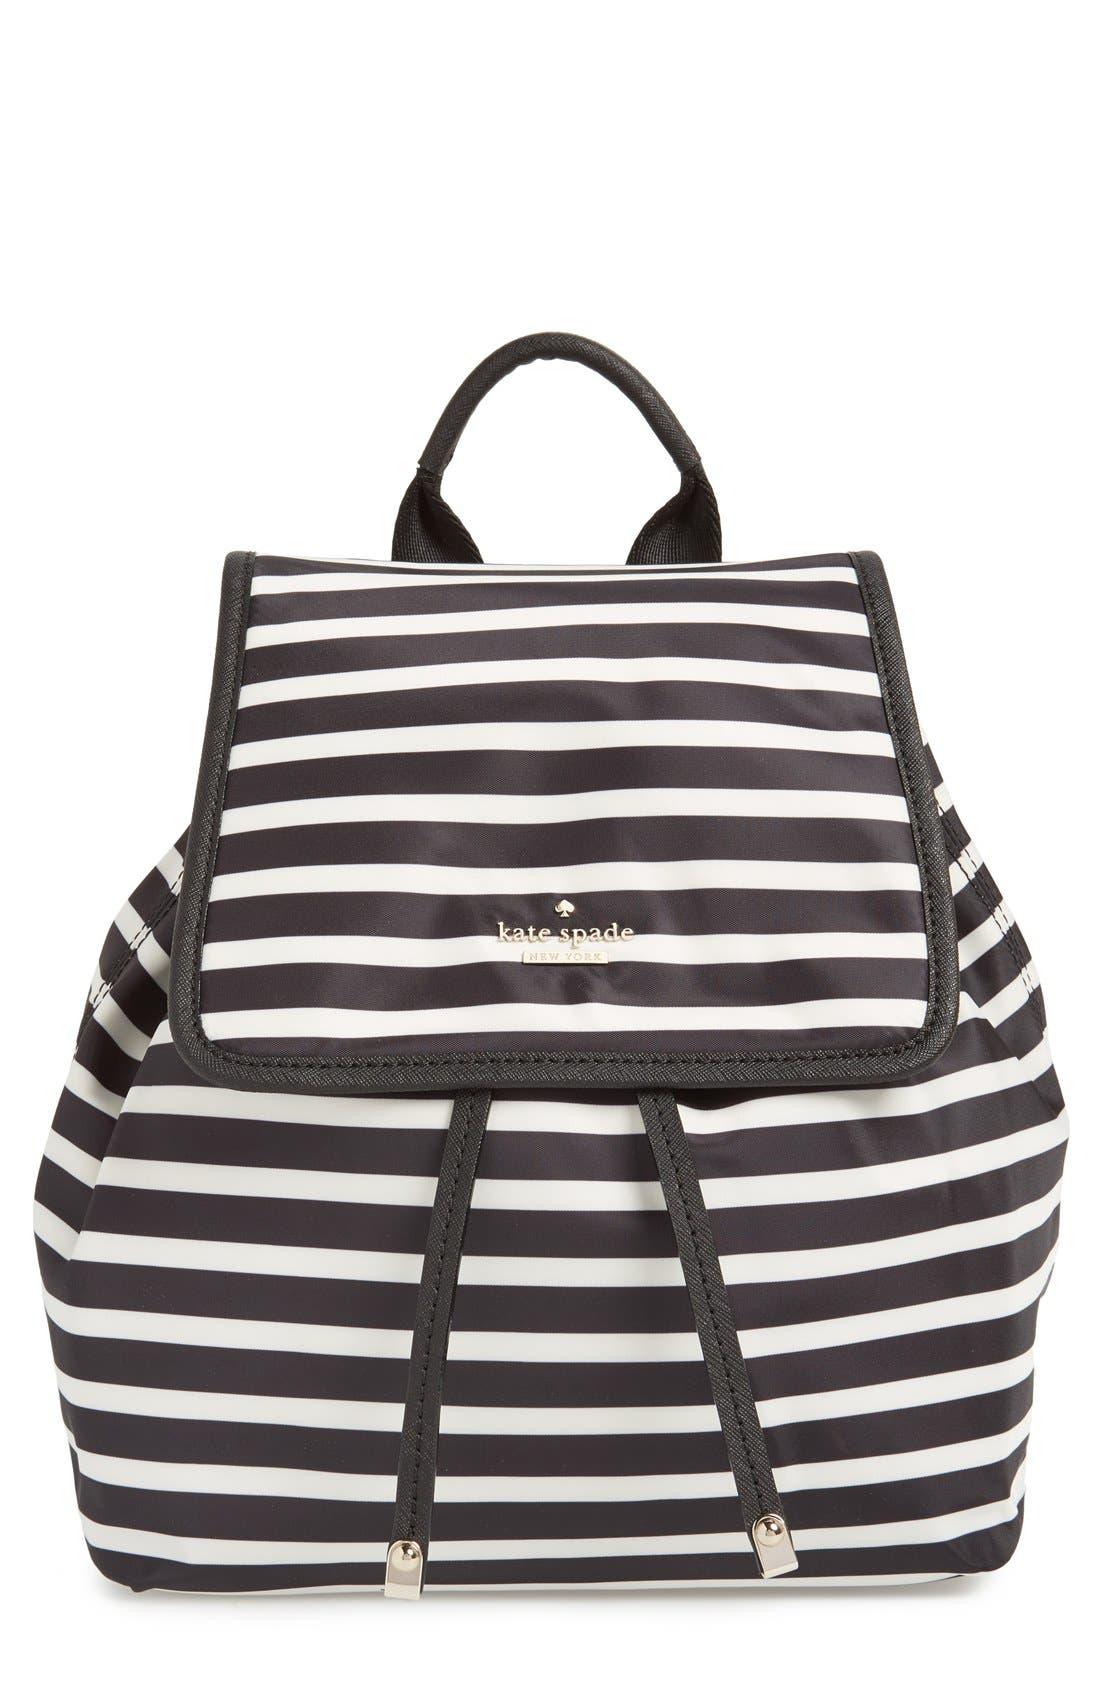 Alternate Image 1 Selected - kate spade new york 'molly' nylon backpack